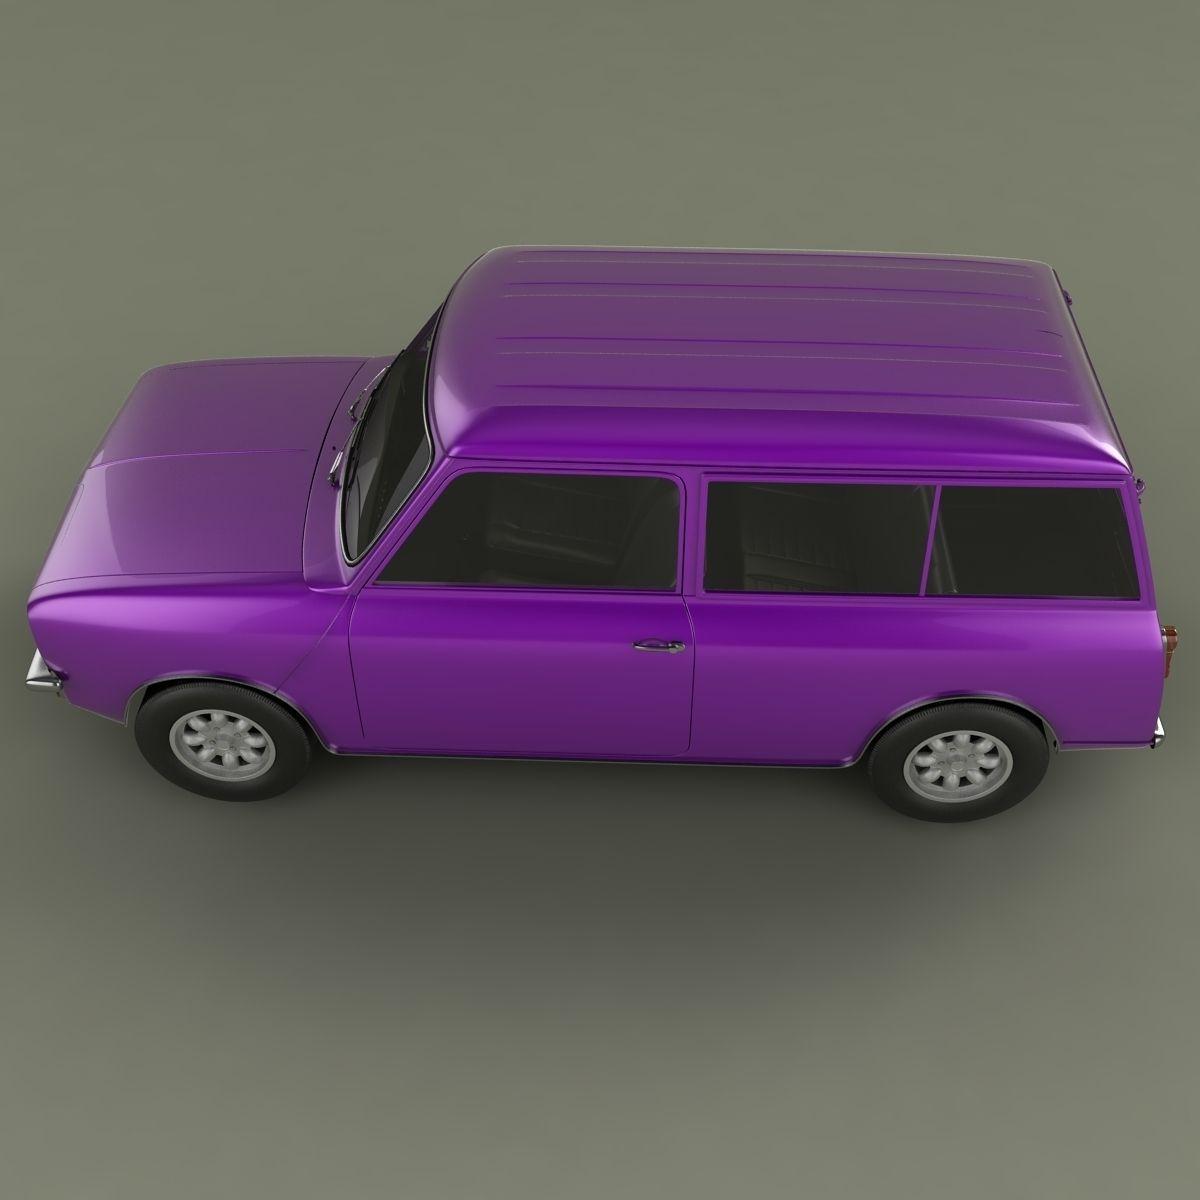 austin mini clubman estate 3d model max obj. Black Bedroom Furniture Sets. Home Design Ideas